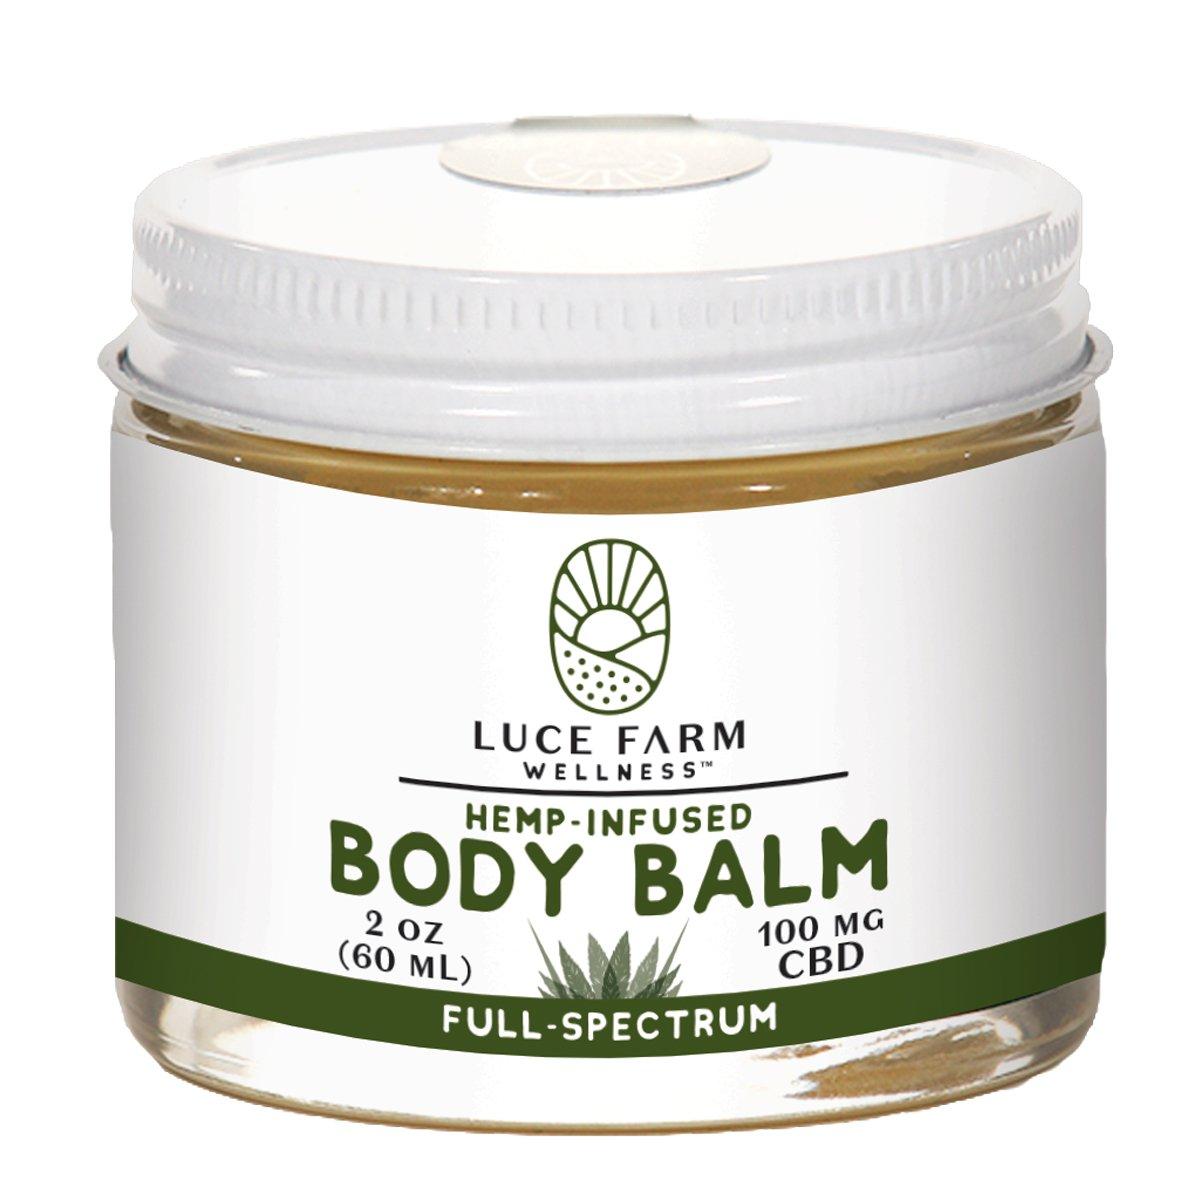 Luce Hill Farm Body Balm